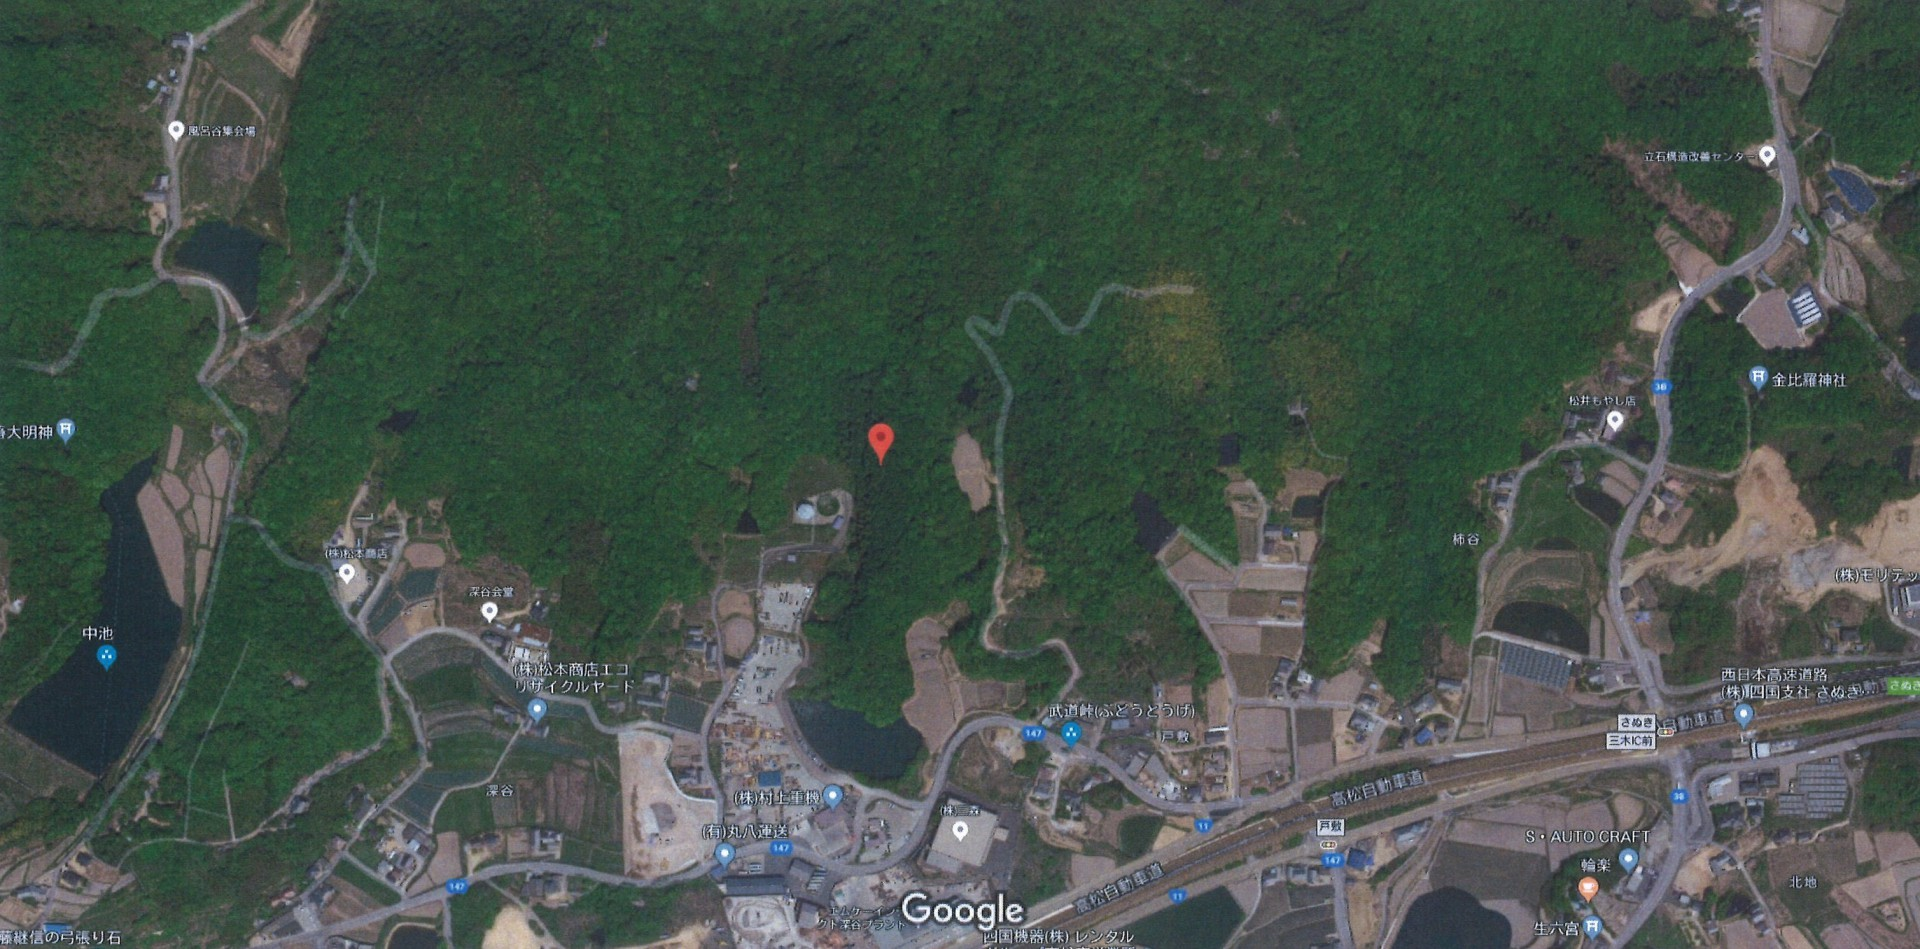 【JPN】FIT18円 木田郡三木町発電所のメイン画像